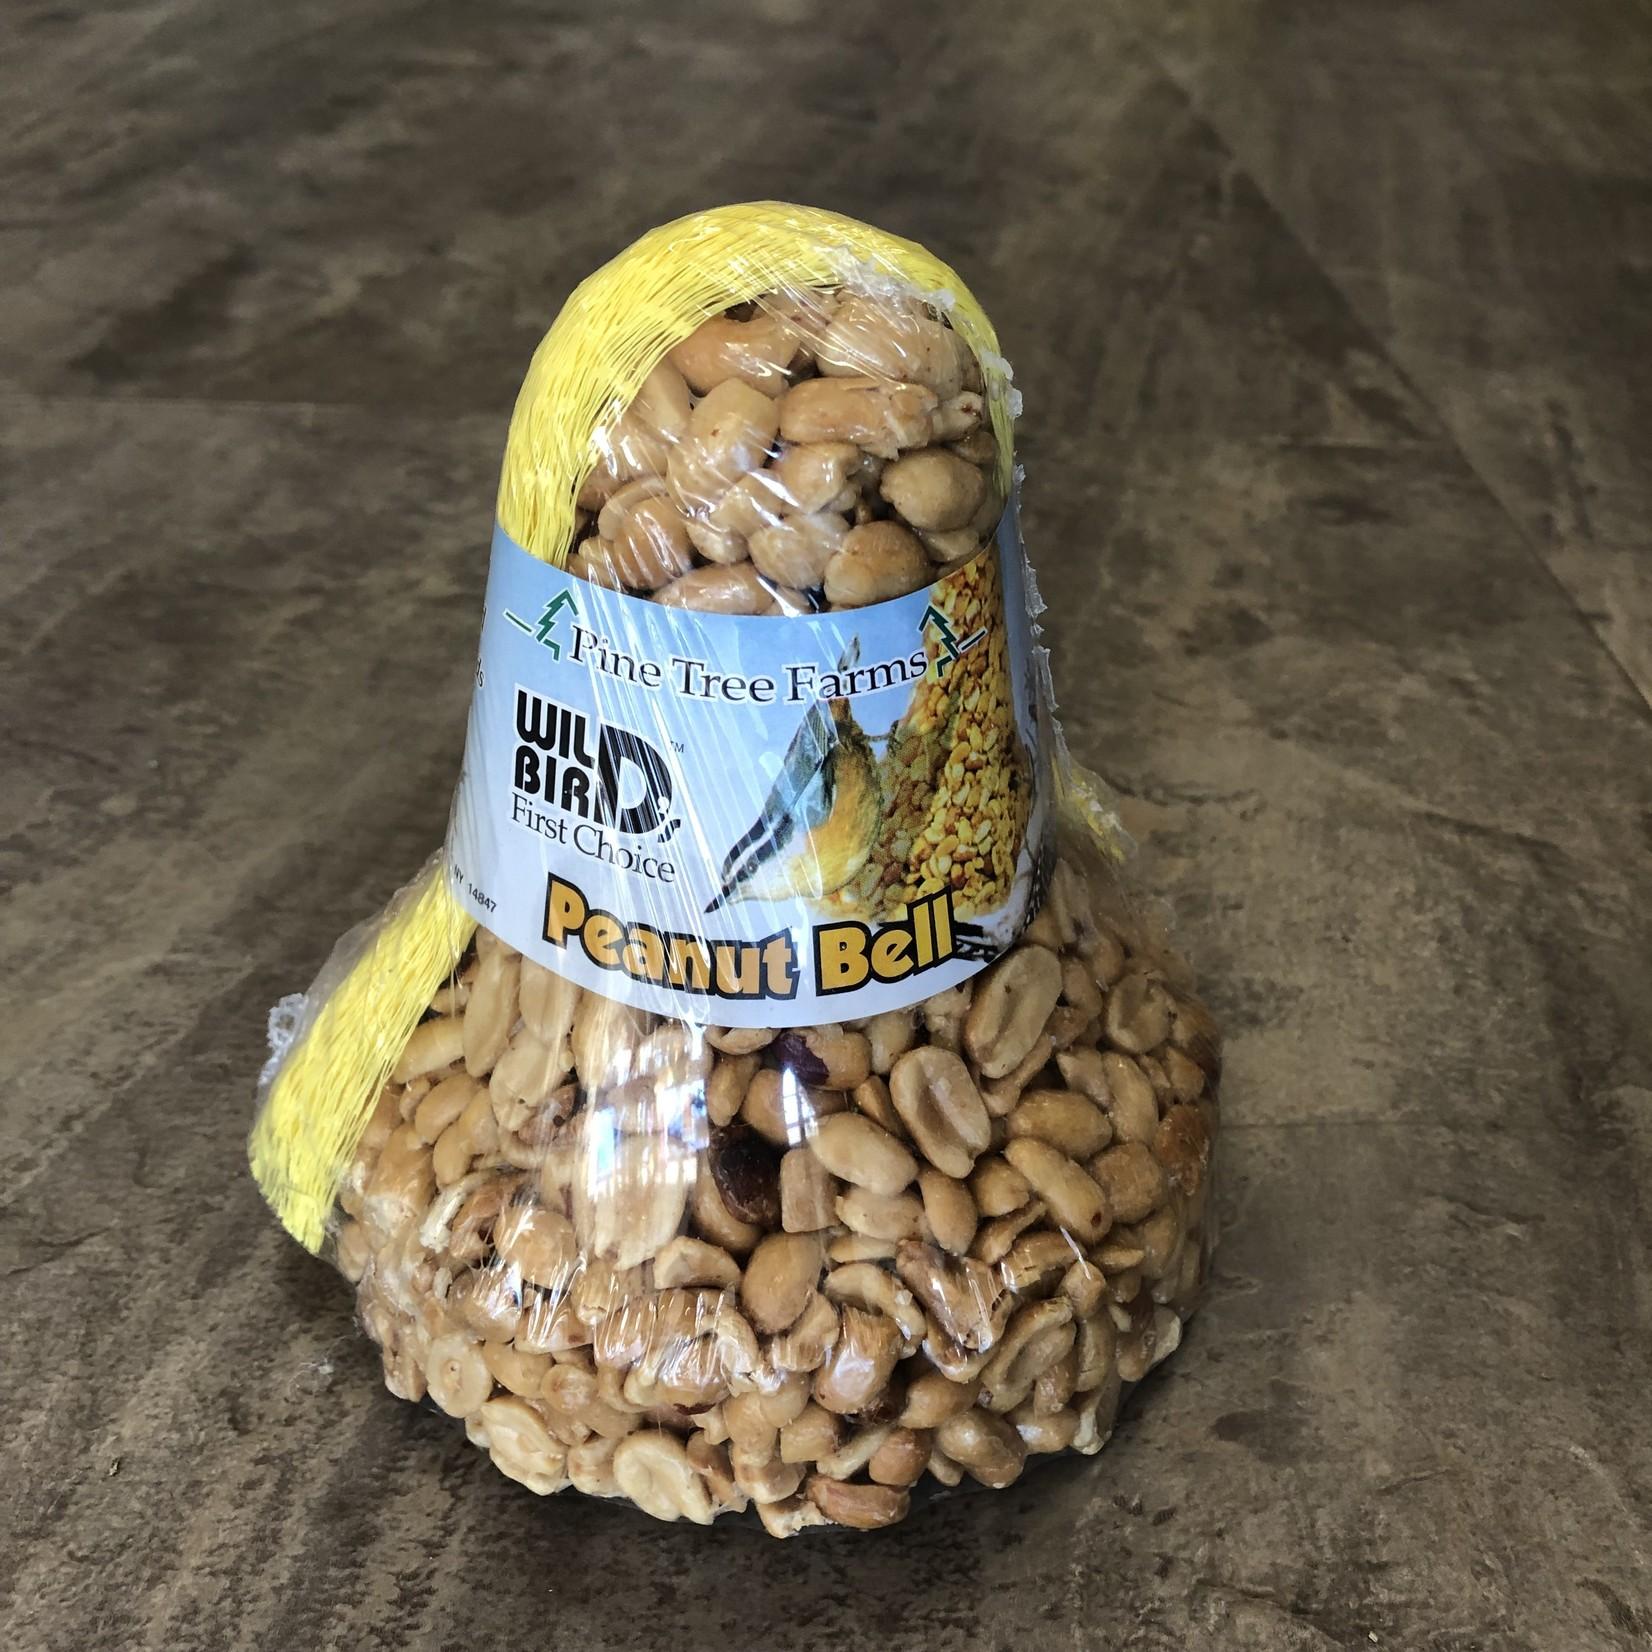 Pine Tree Peanut Bird Bell